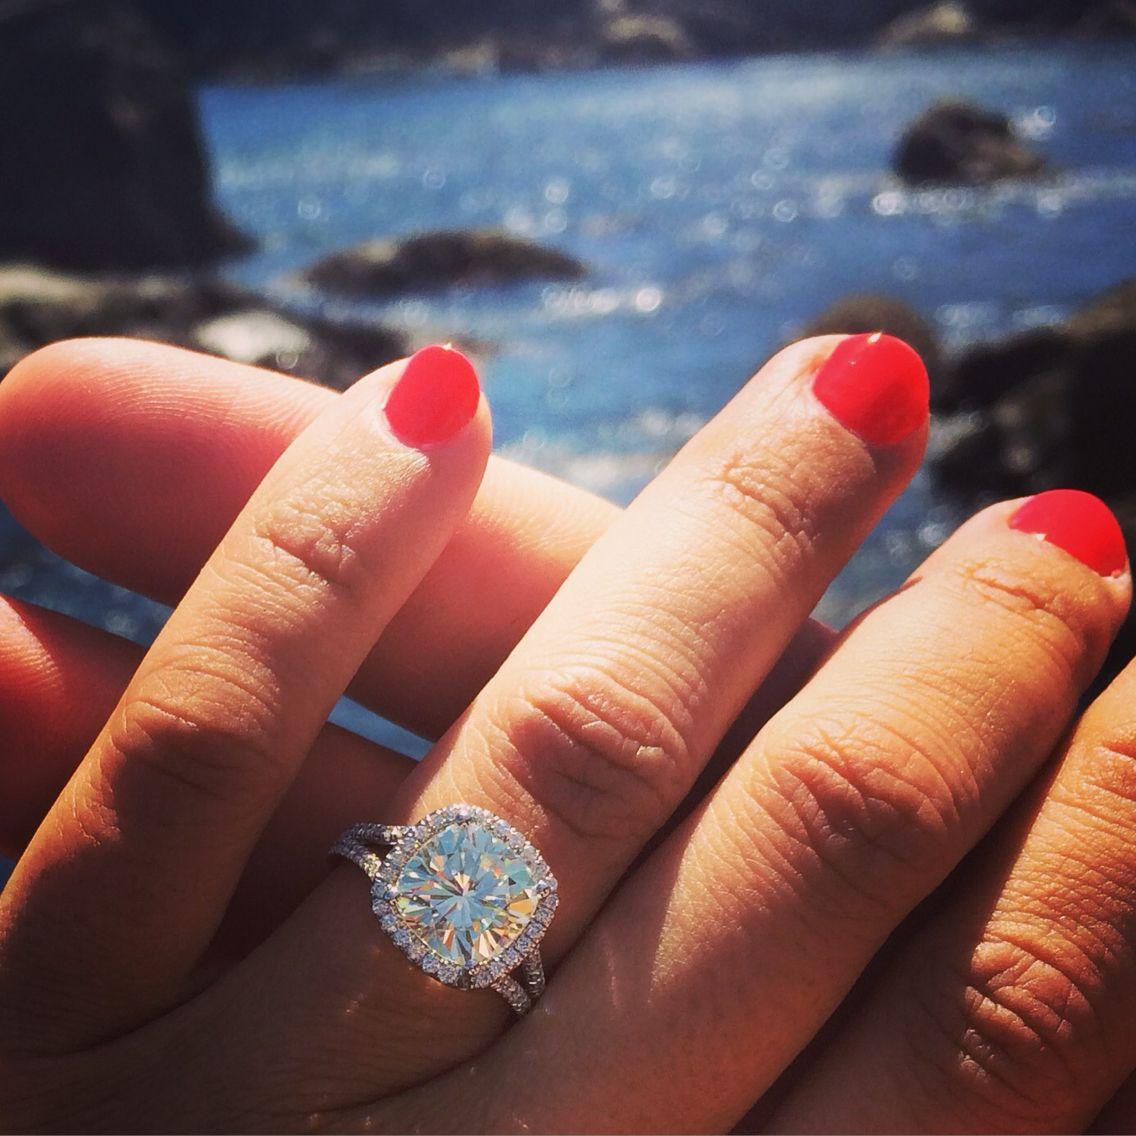 My Engagement Ring 4 Ct Cushion Cut Split Shank